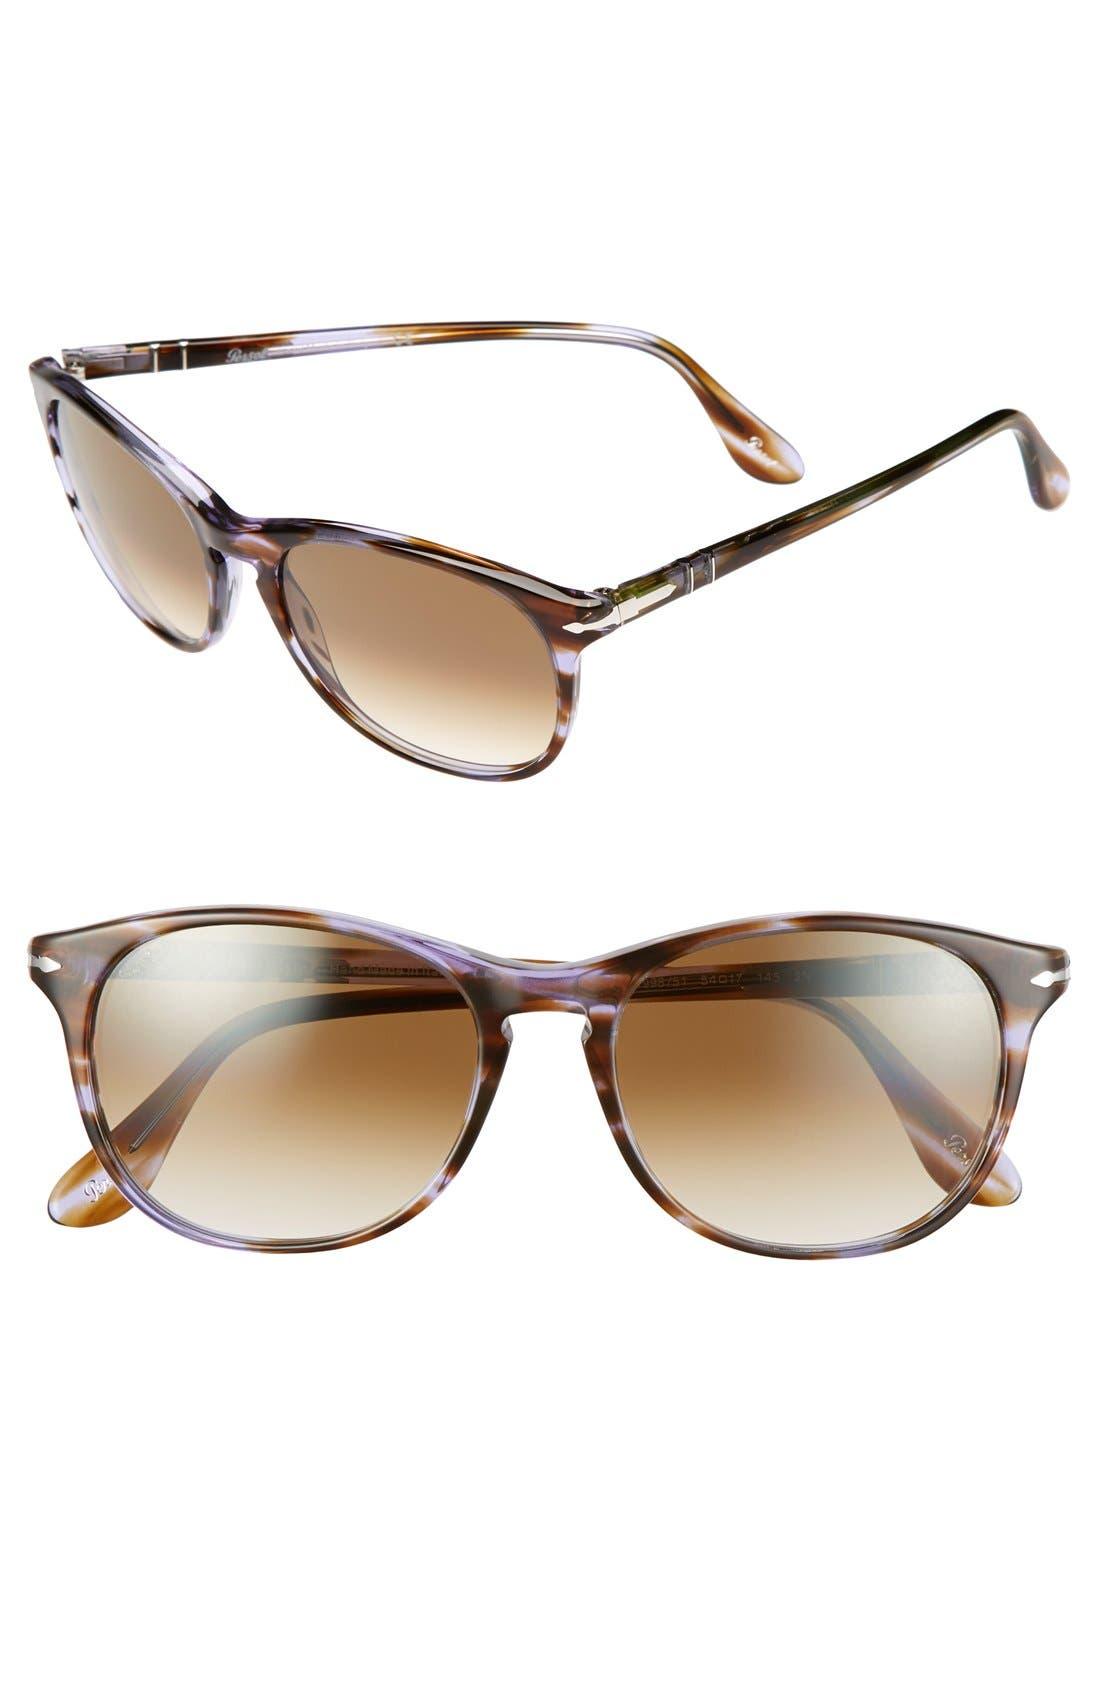 Main Image - Persol 'Suprema Circle' 54mm Sunglasses